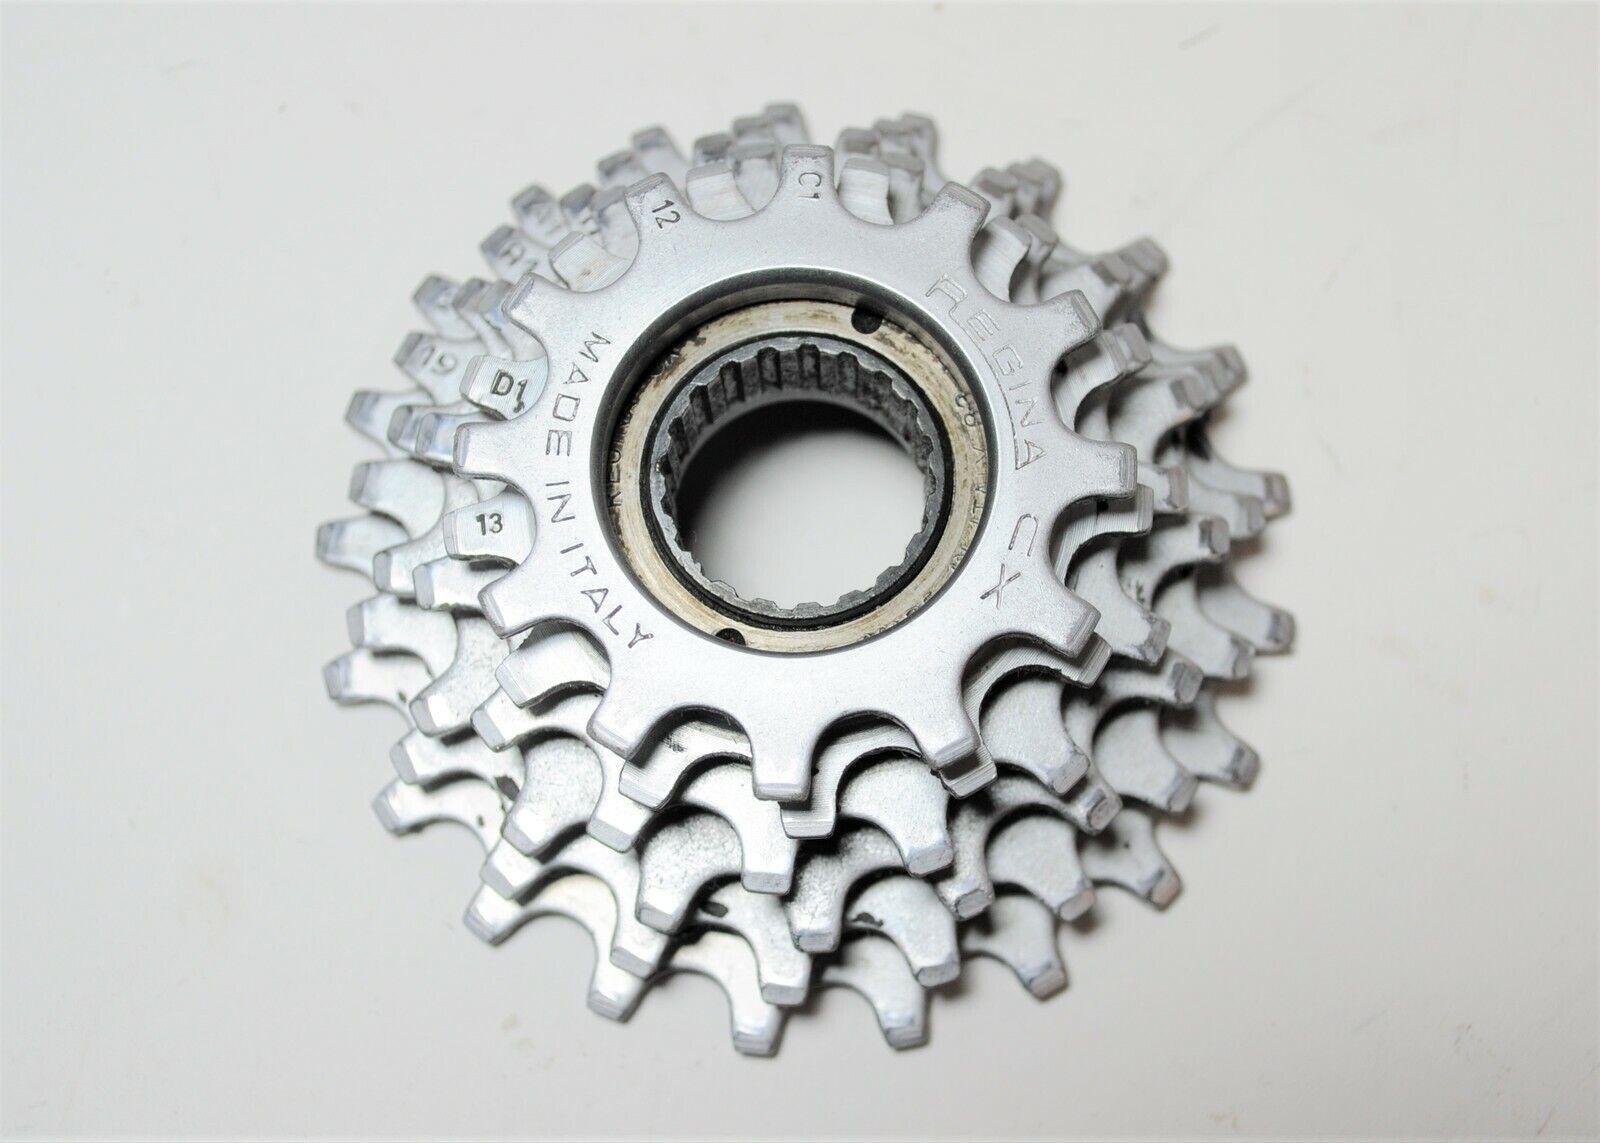 REGINA CX RACE BICYCLE 6 SPEED 12-13-15-17-19-21 TOOTH FREEWHEEL